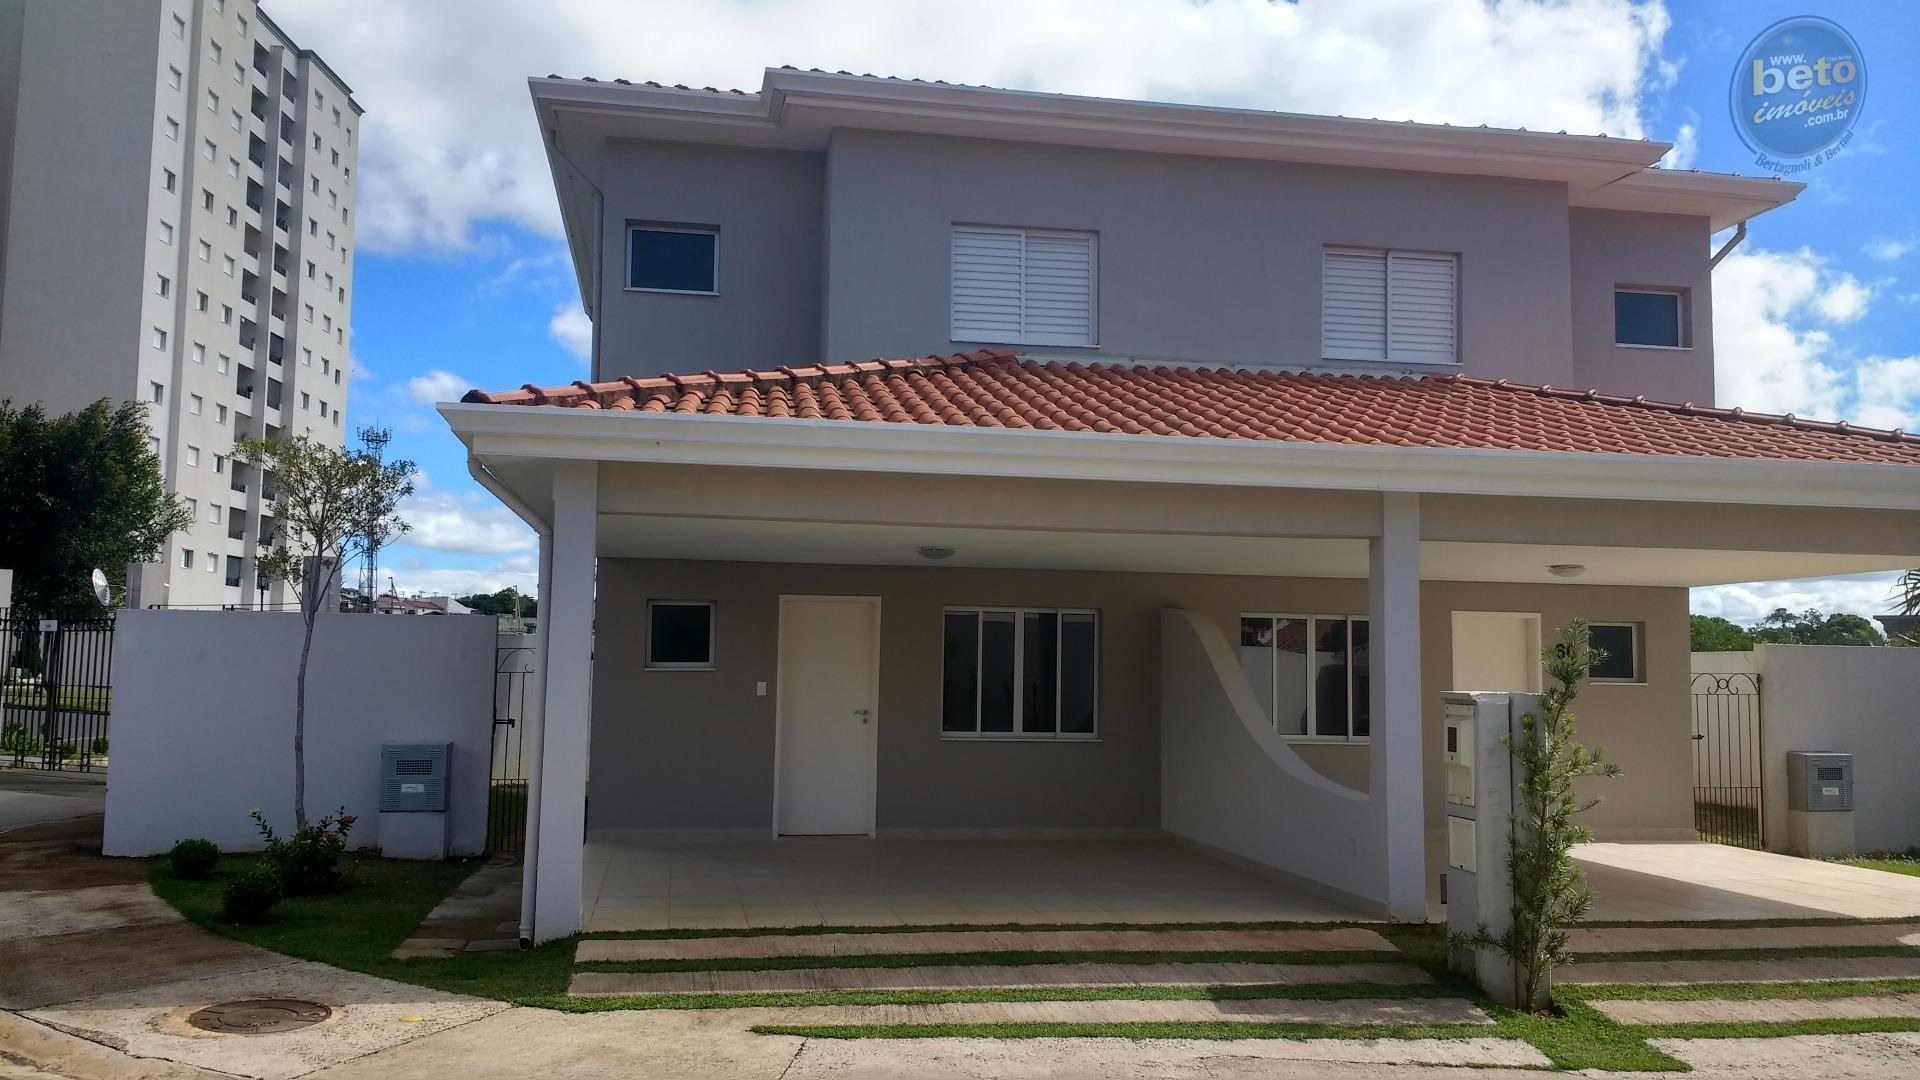 Casa residencial à venda, Condomínio Residencial Vila Bella, Itu - CA3410.